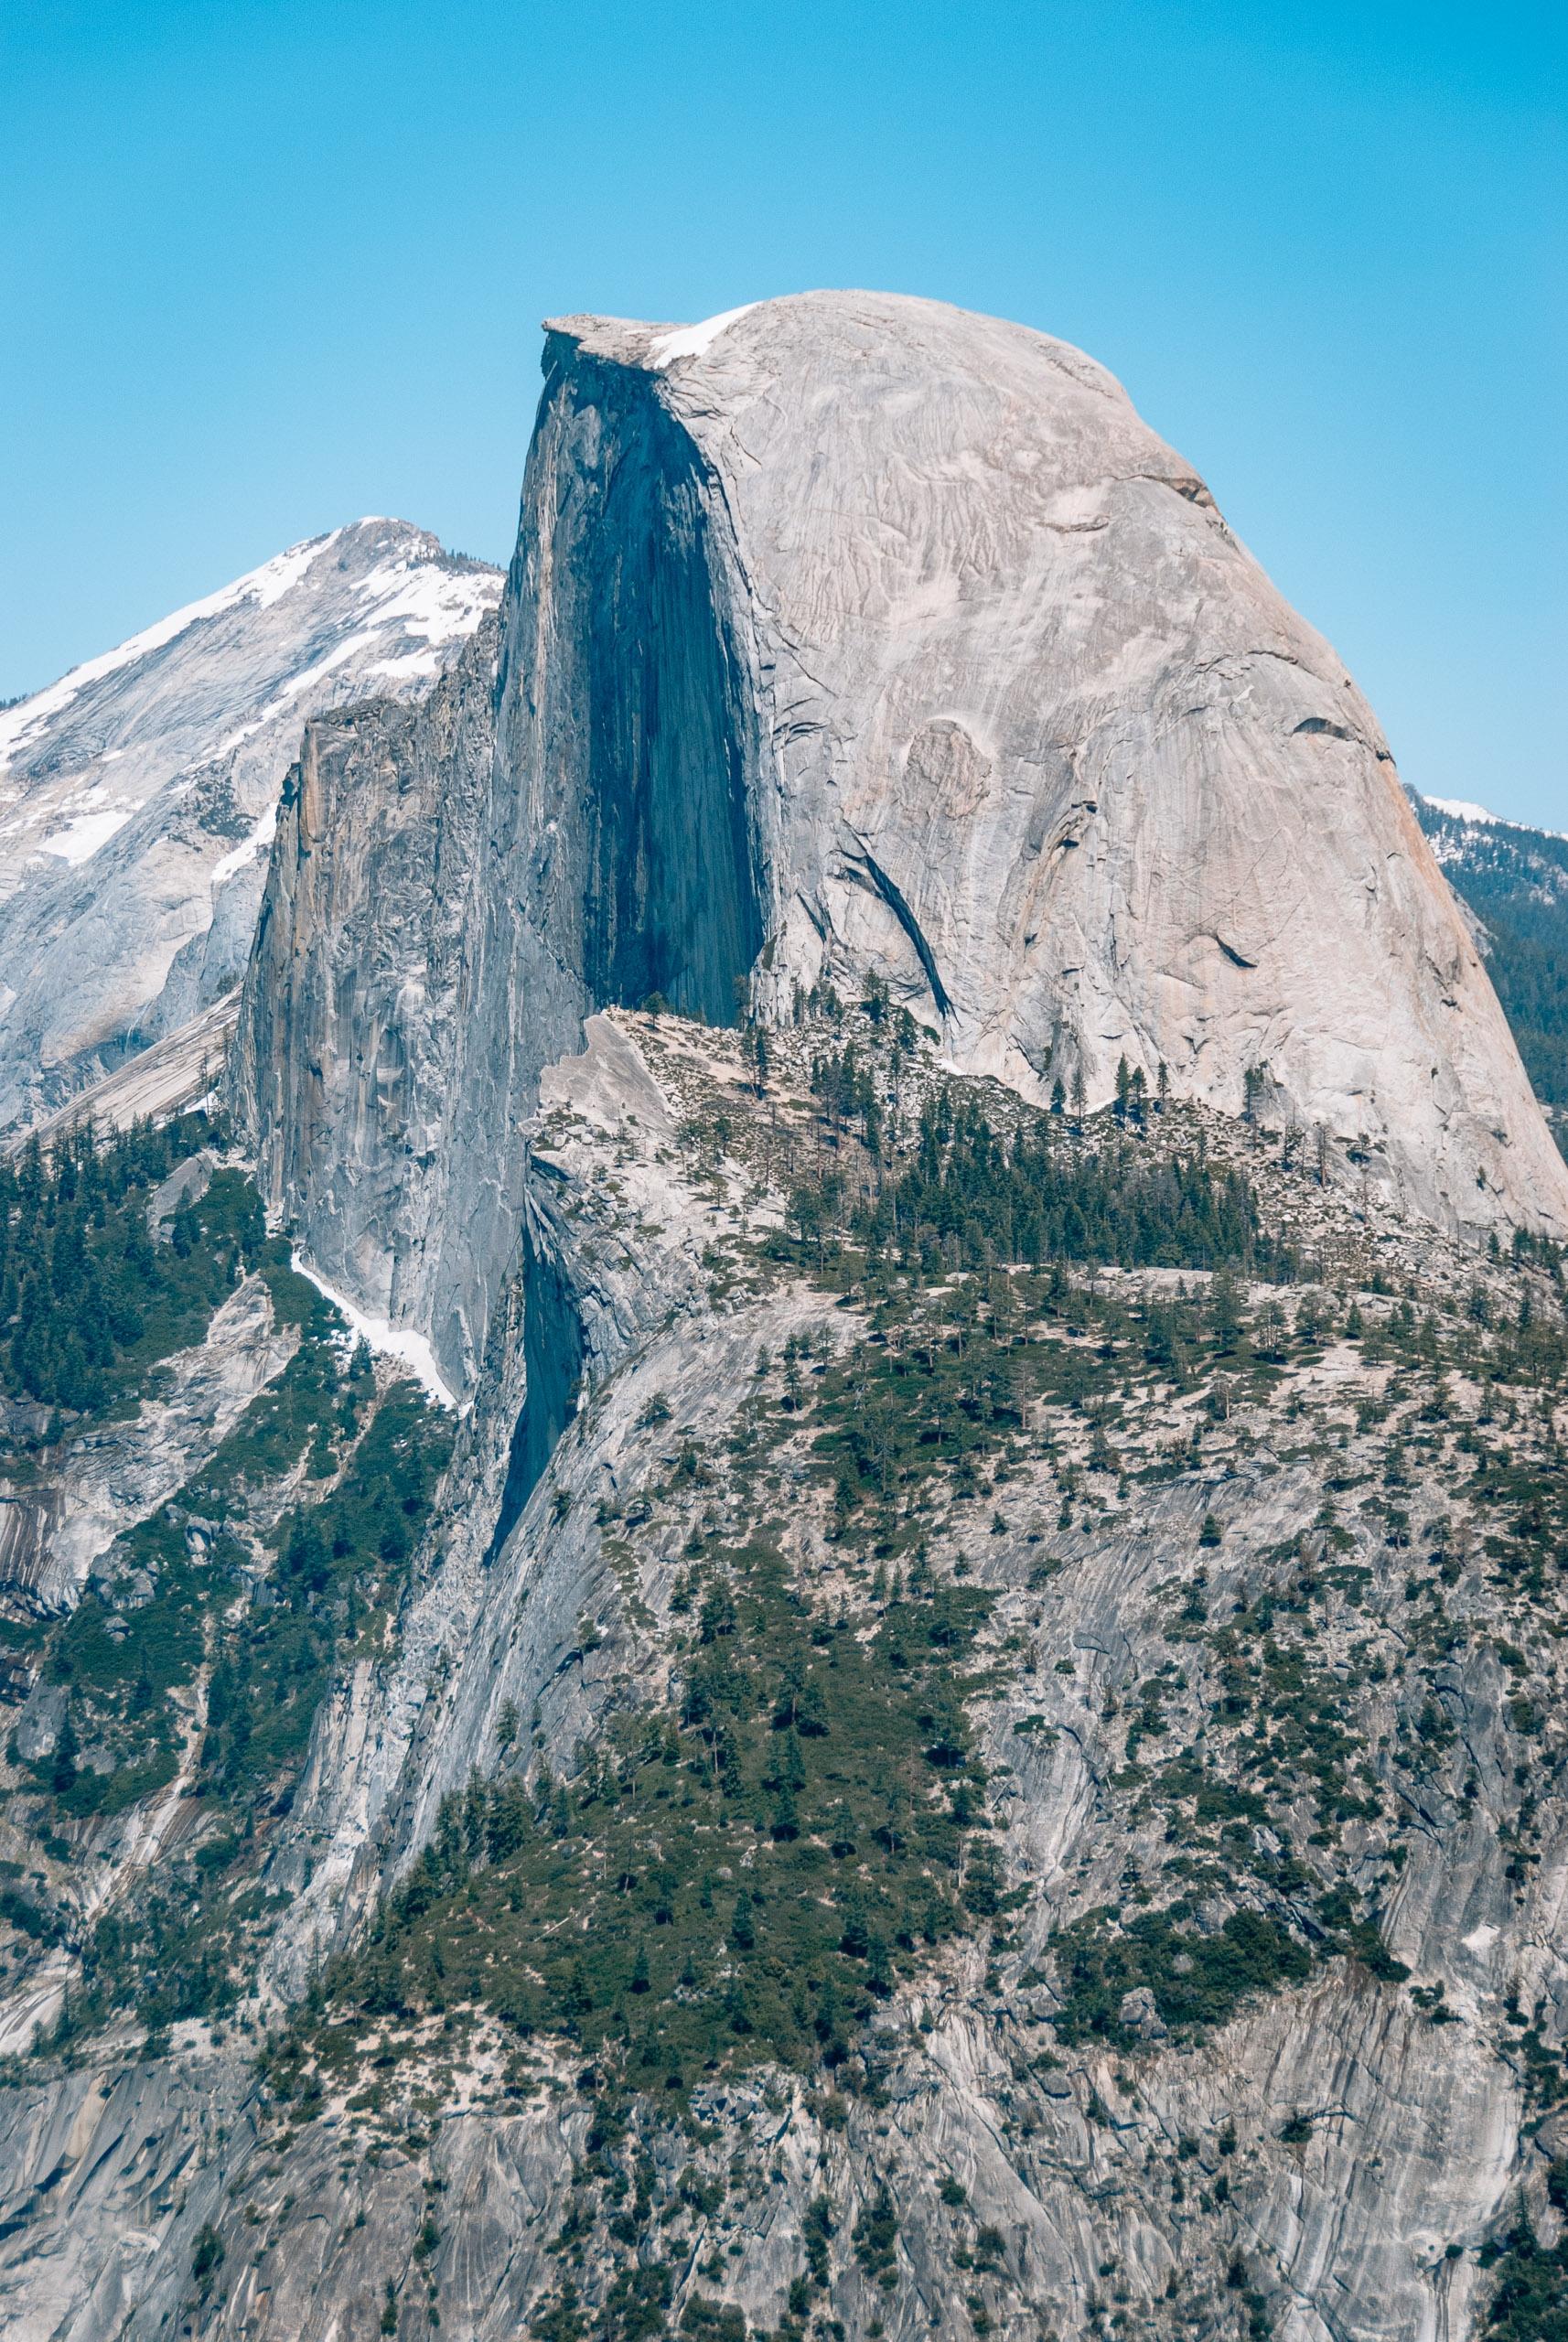 Yosemite National Park - 2009-0509-DSC_0070_73354